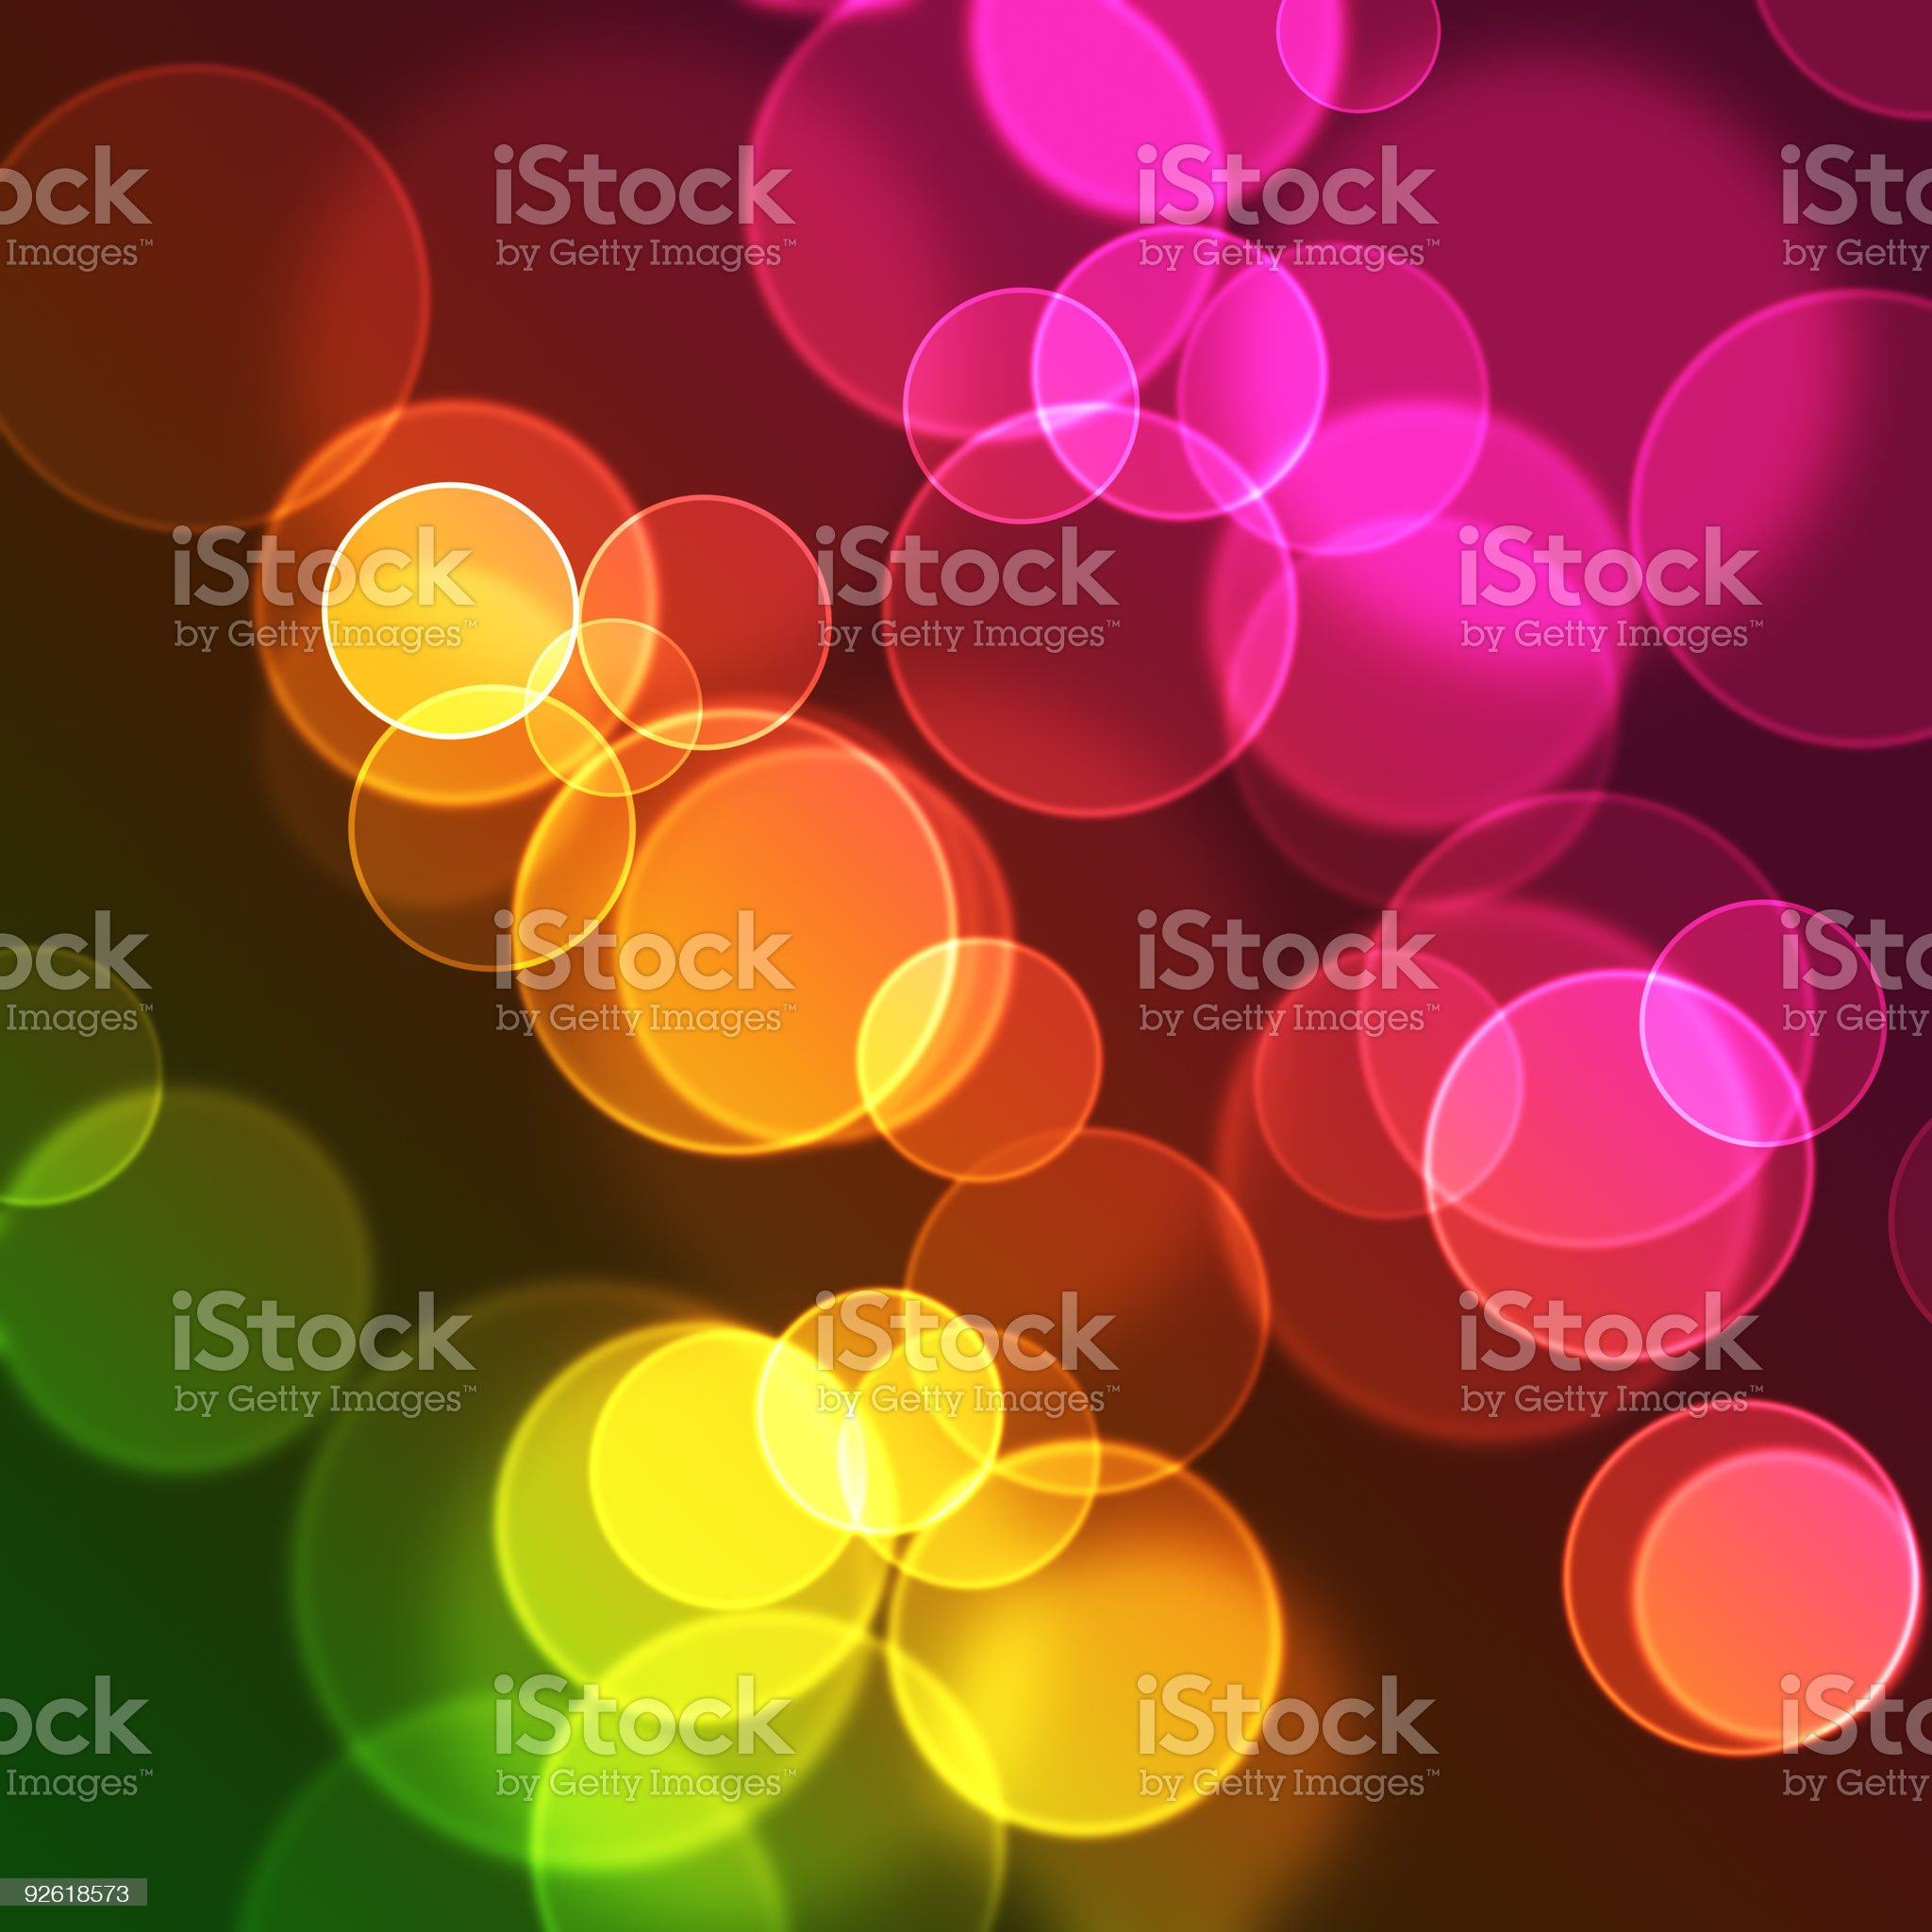 Defocused lights royalty-free stock photo